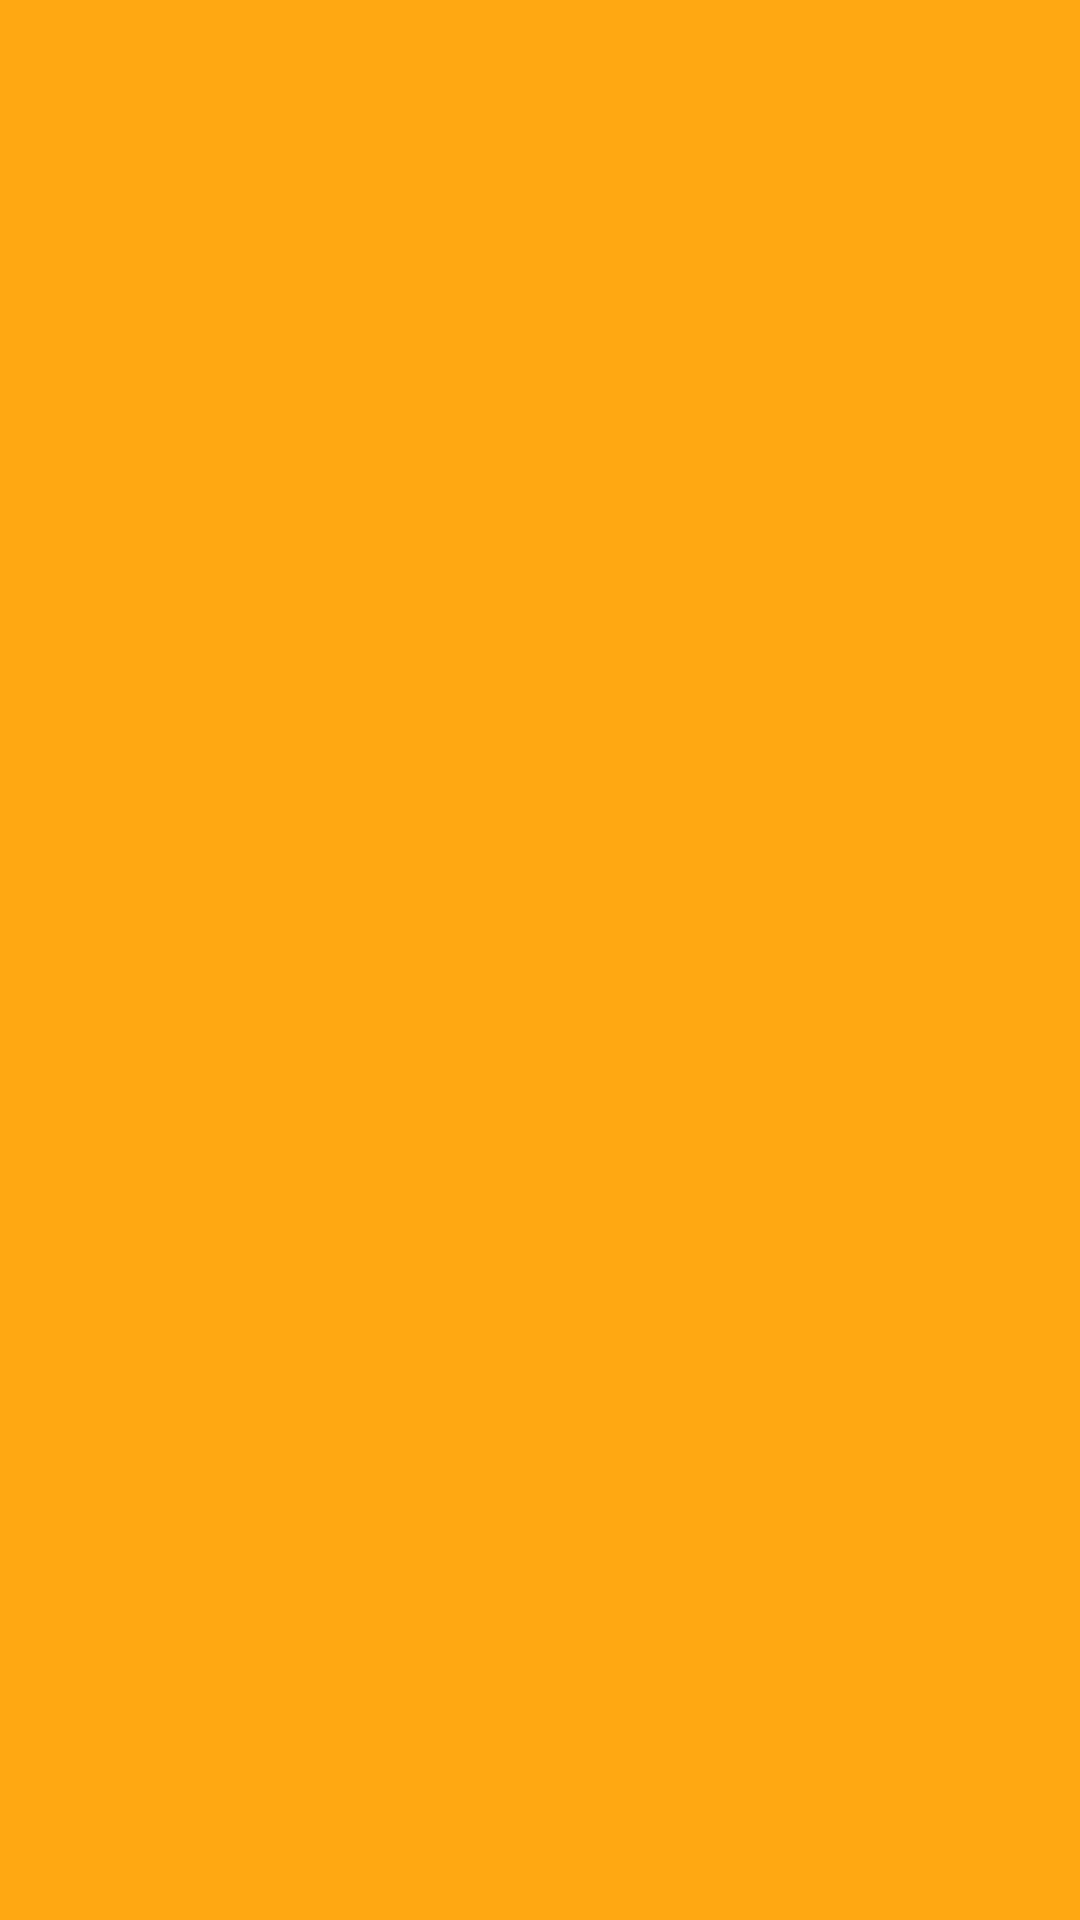 1080x1920 Dark Tangerine Solid Color Background